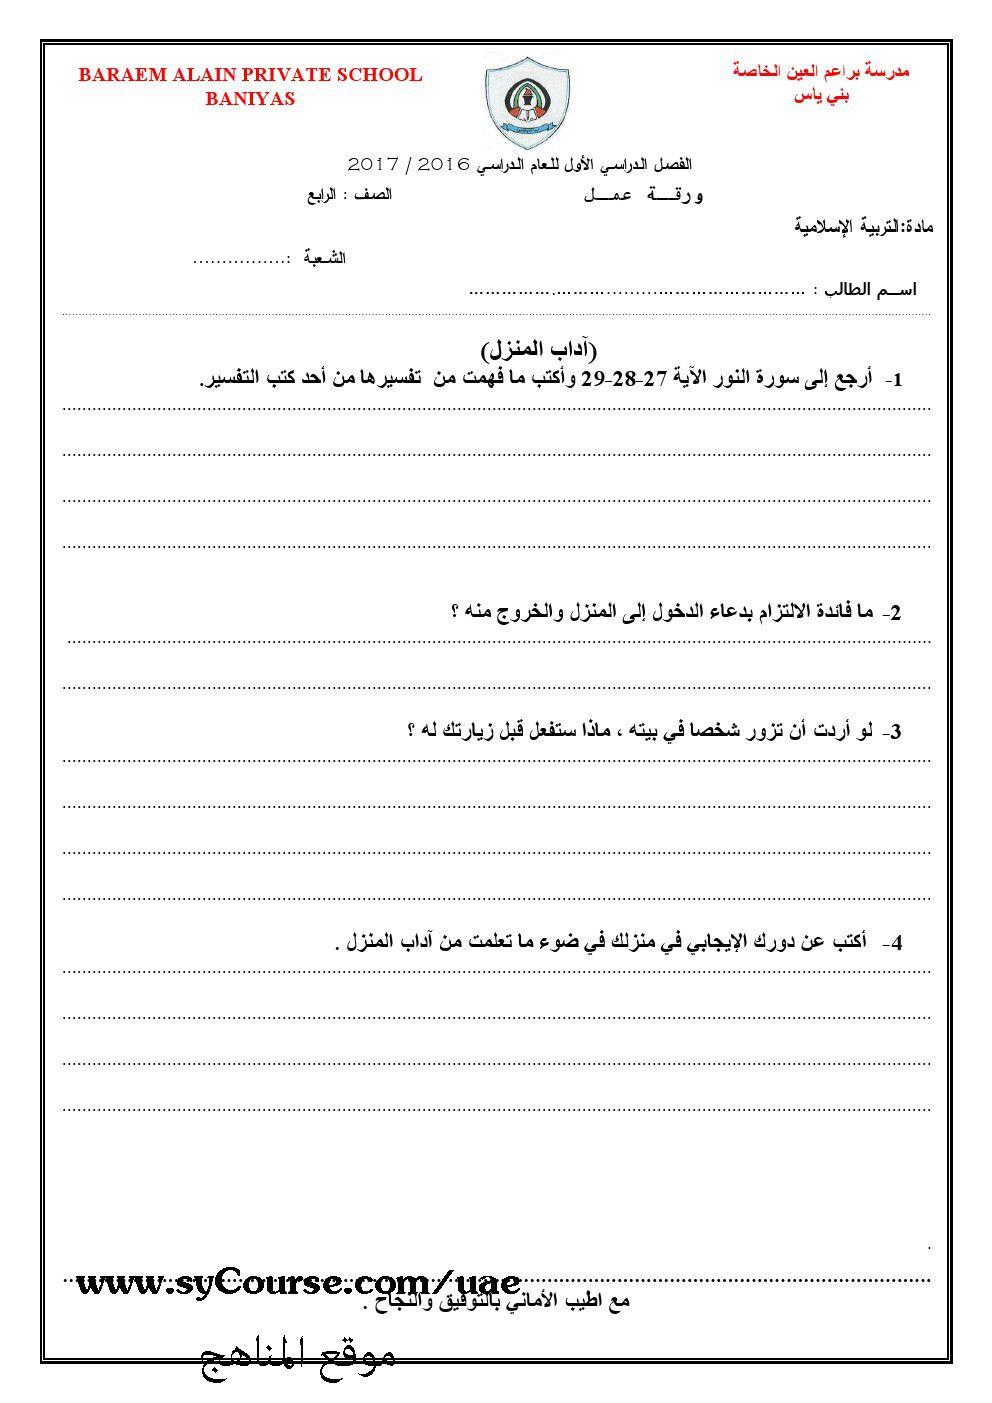 Pin By Mirvat Shagouj On Islam ديني Arabic Language Private School Language